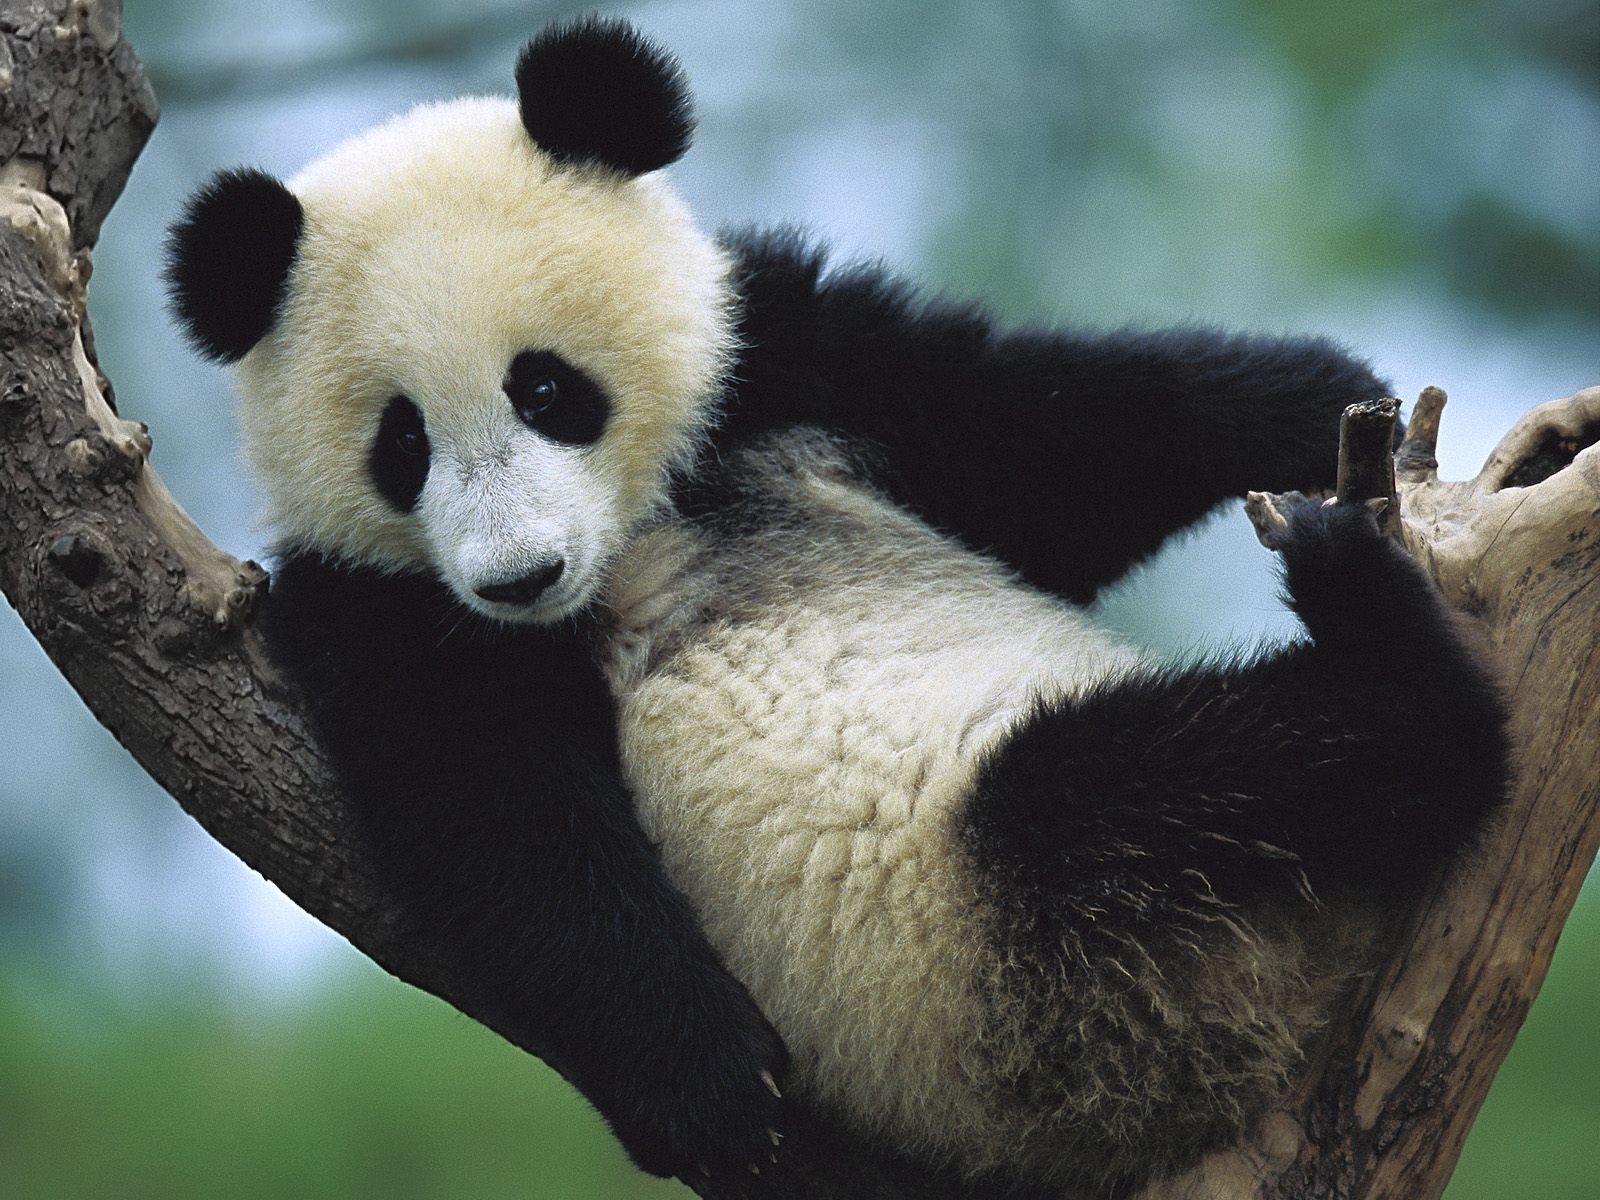 Amazing Giant Panda Endangered Species Giant Pandas Facts Photos 1600x1200